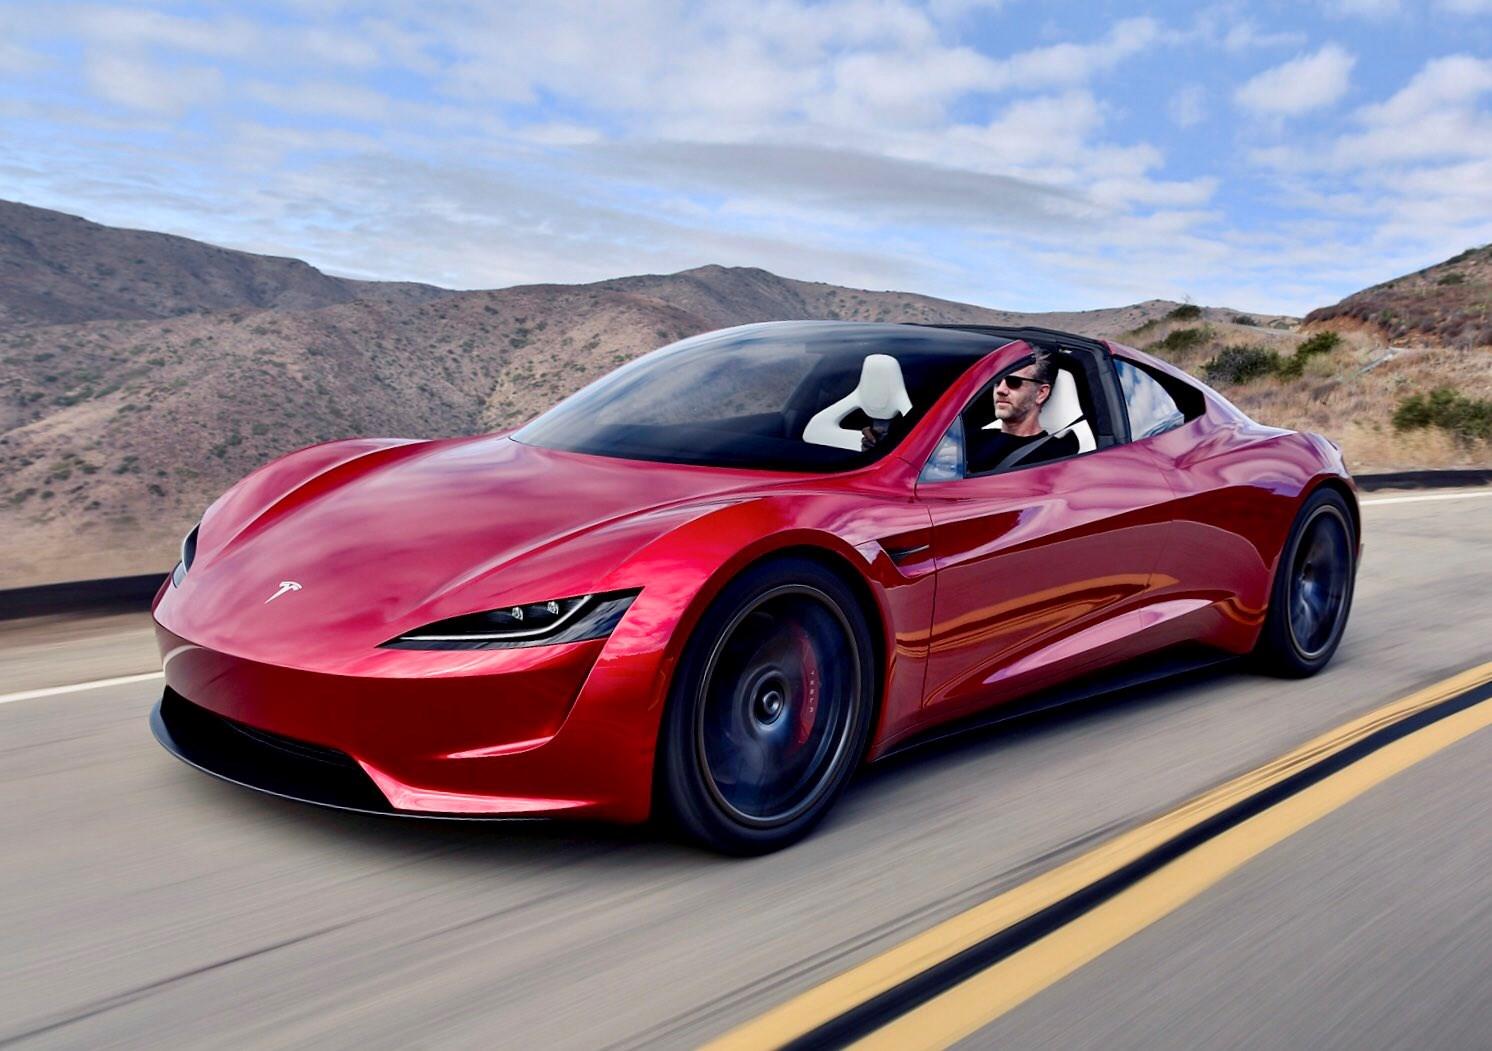 Elon Musk Confirms Tesla Roadster Will Hit The Nurburgring ...